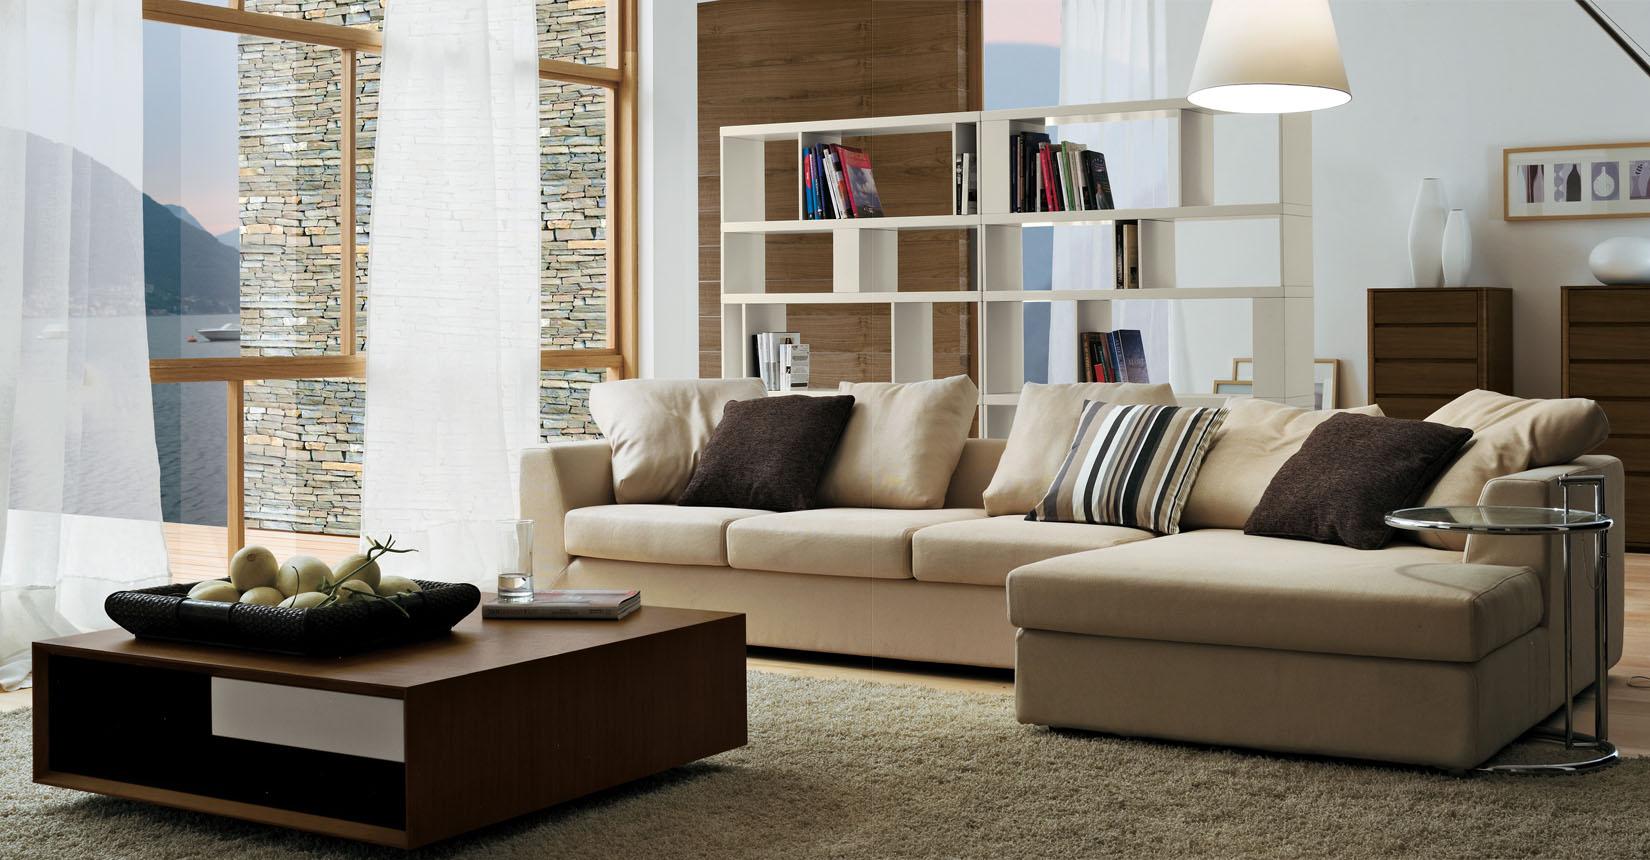 Muebles para tv en puerto rico for Decoracion family room moderno